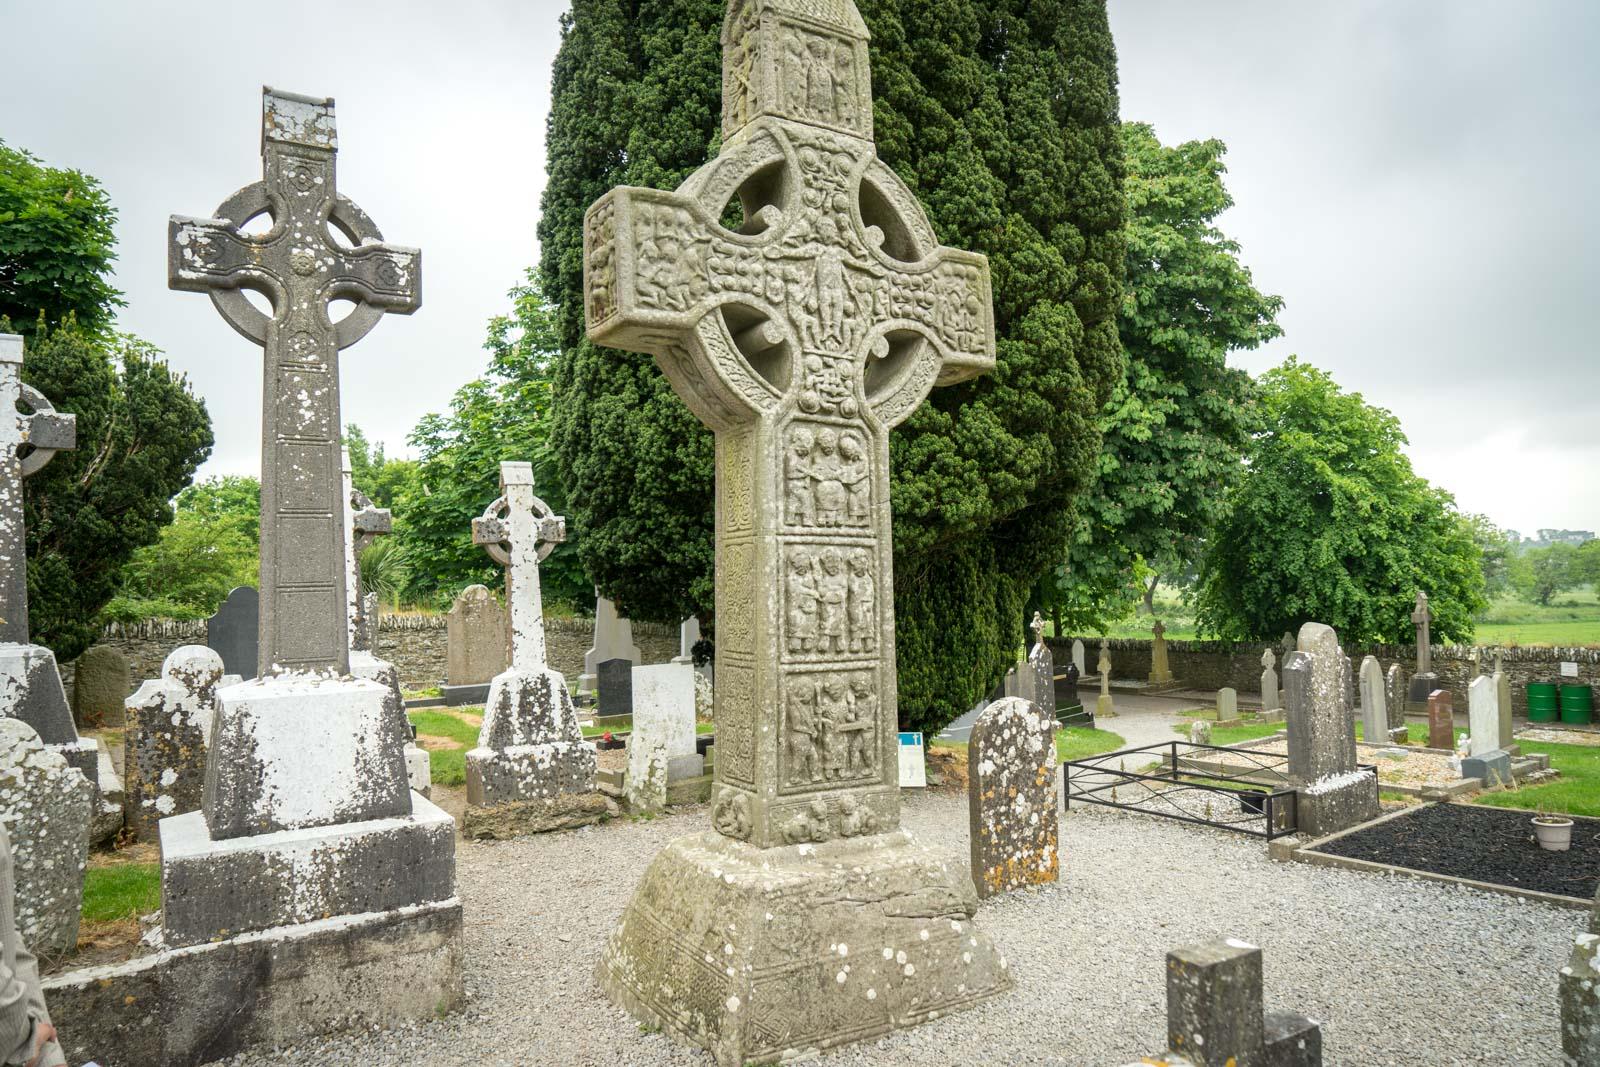 Monasterboice, Ireland